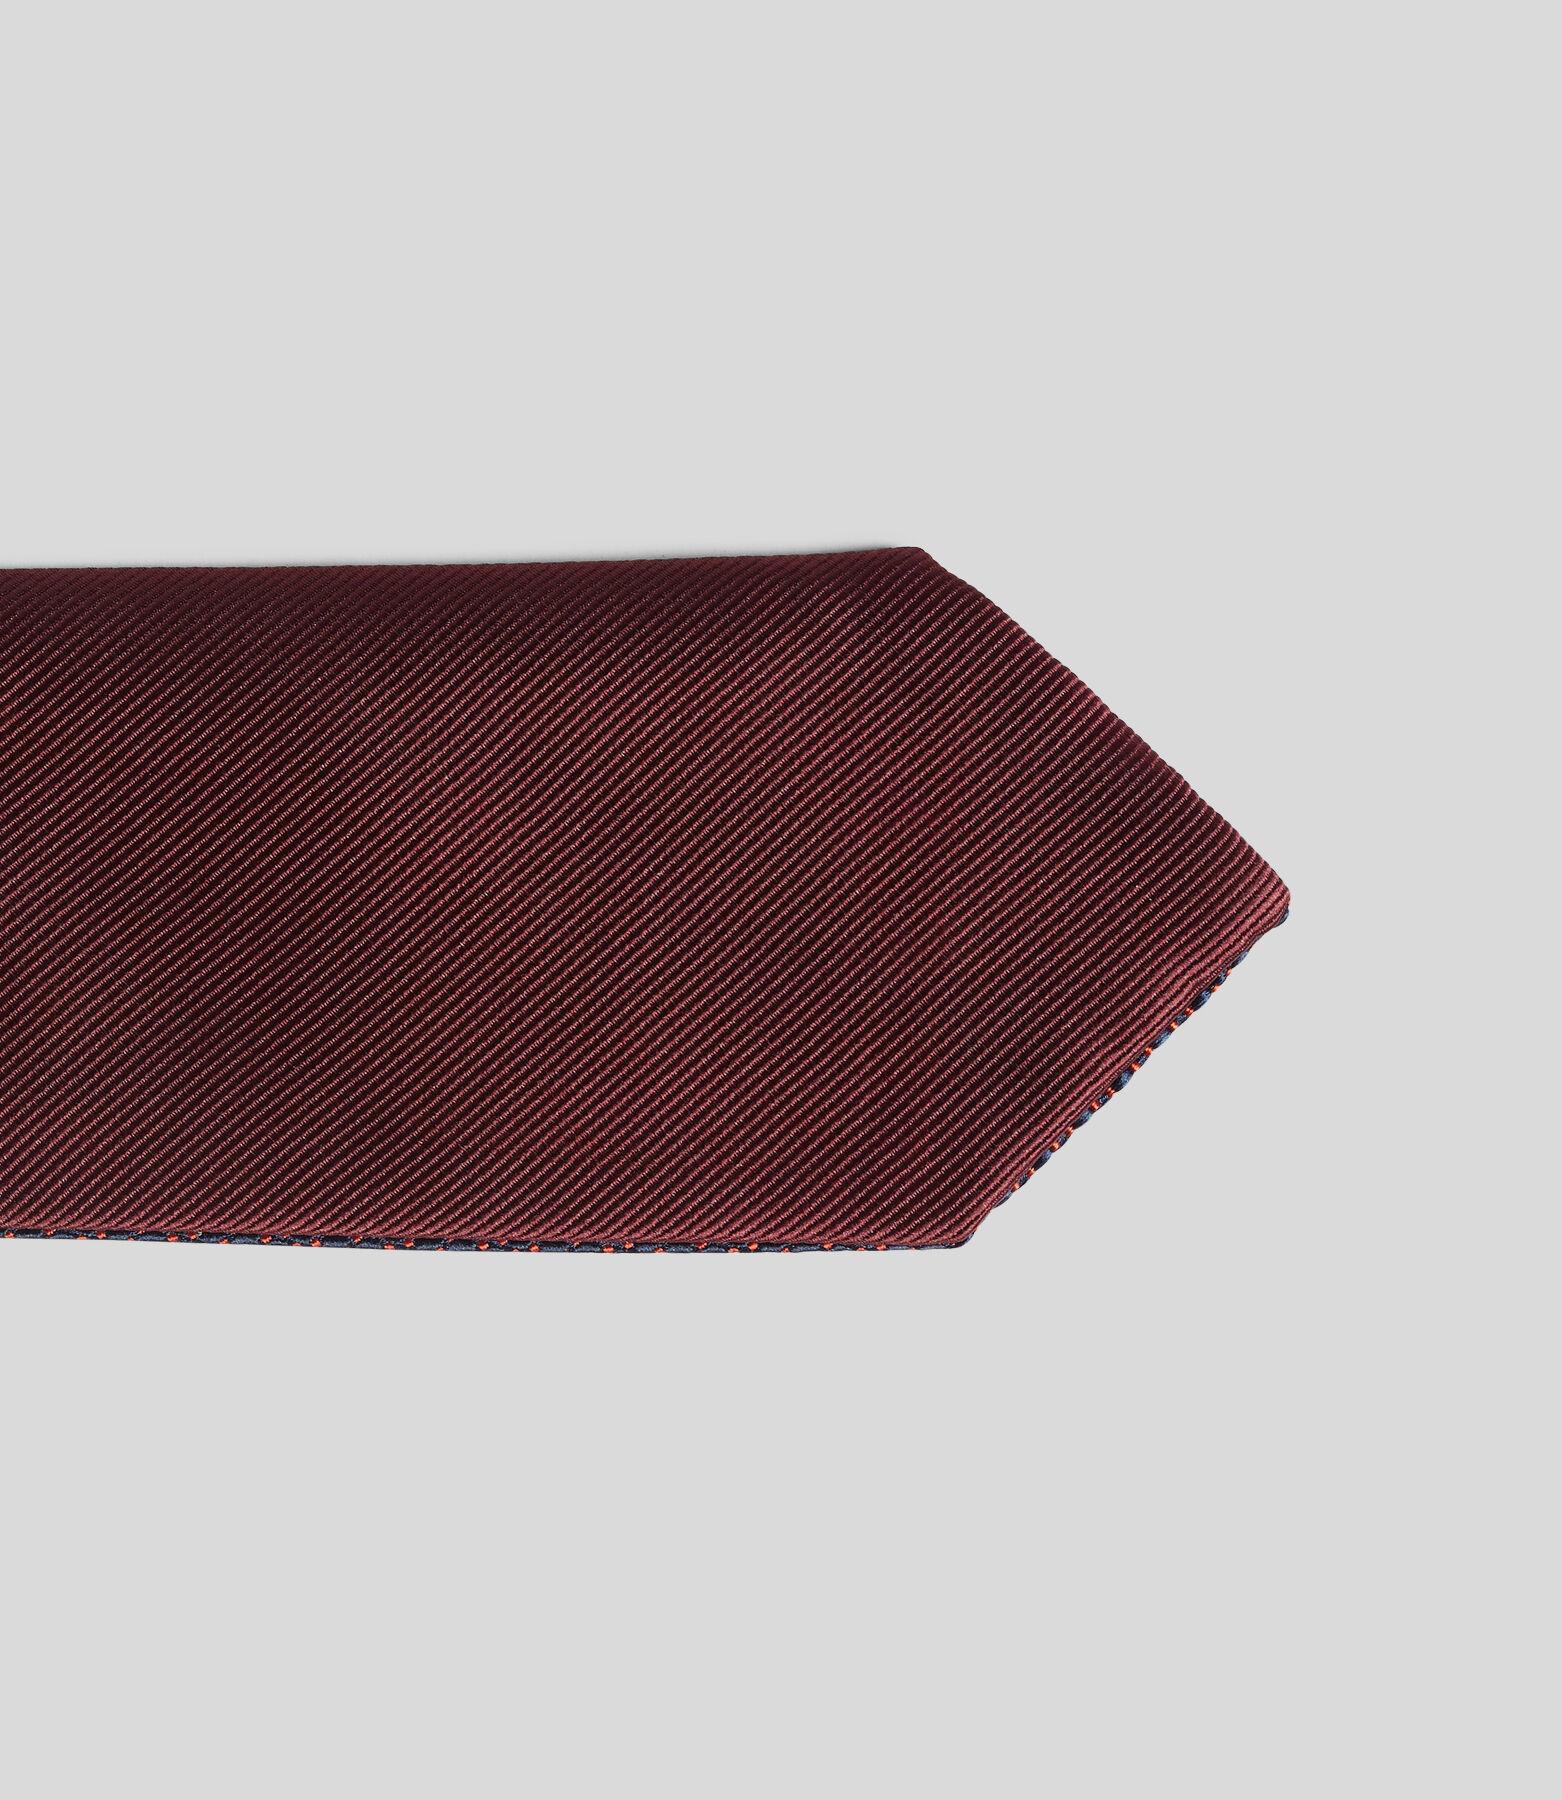 Cravate reversible homme